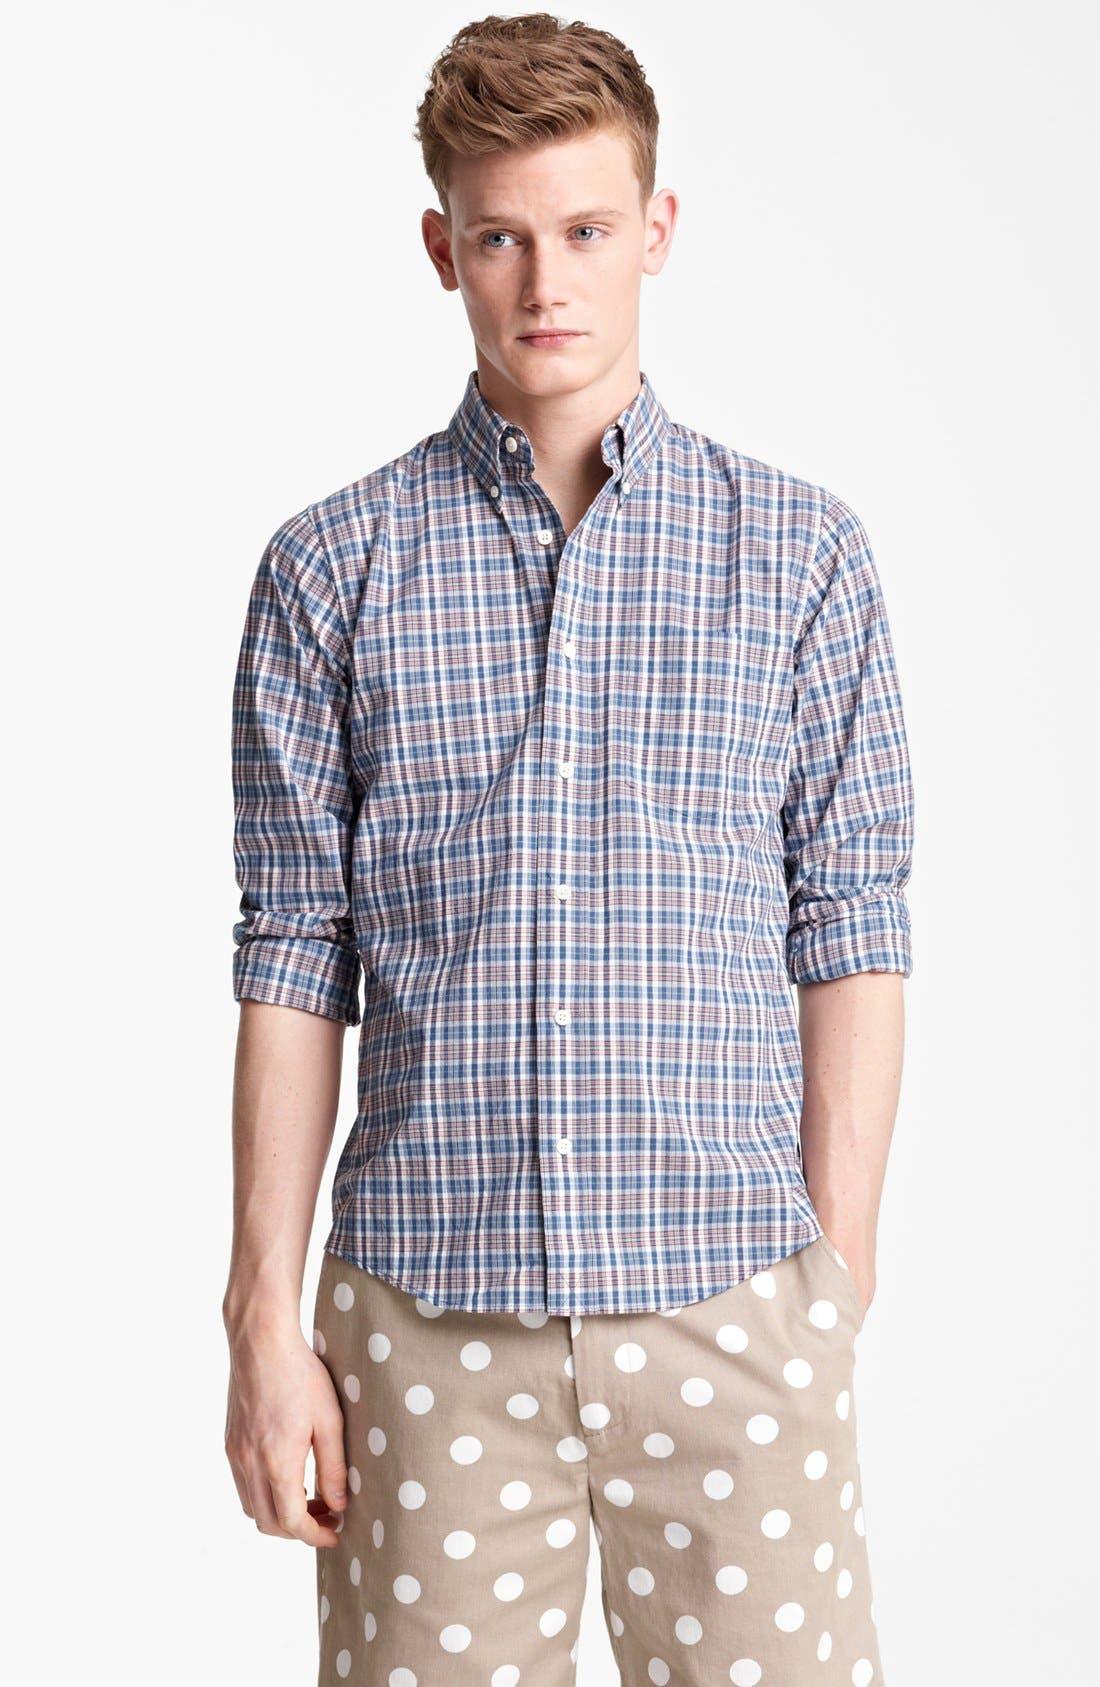 Alternate Image 1 Selected - Jack Spade 'Serge' Plaid Sport Shirt